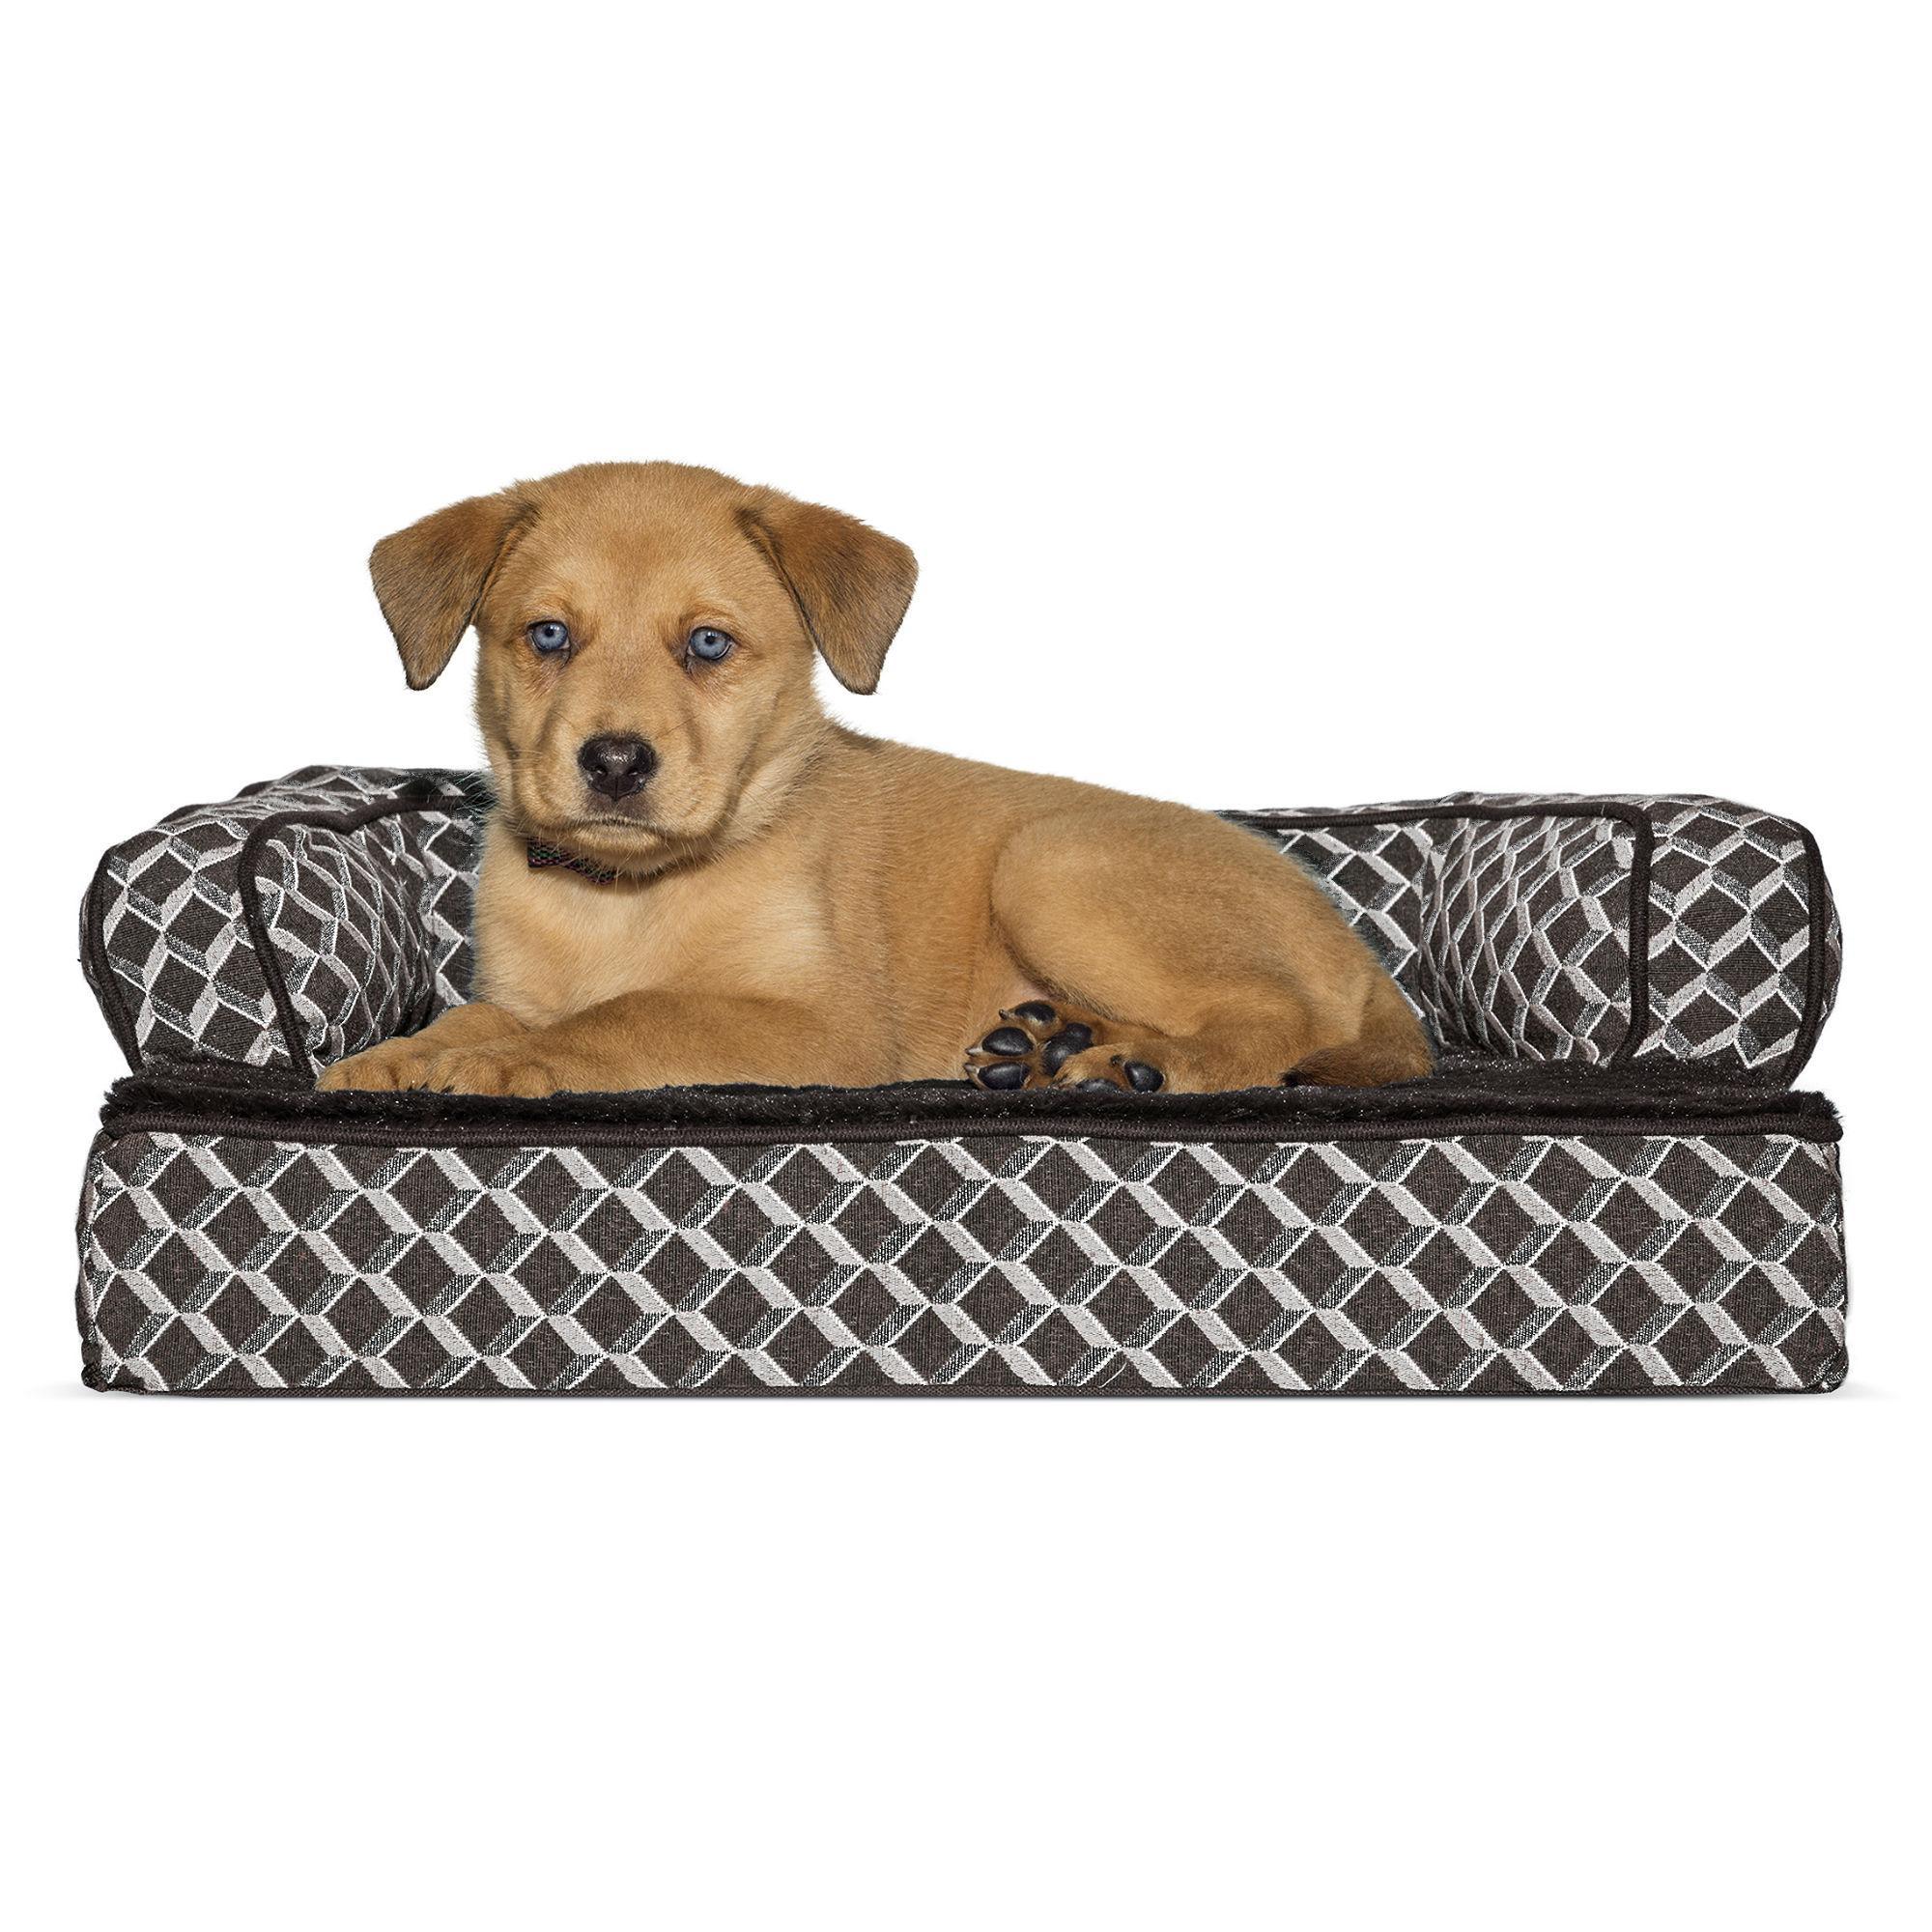 FurHaven Plush & Decor Orthopedic Sofa-Style Pet Bed - Diamond Brown